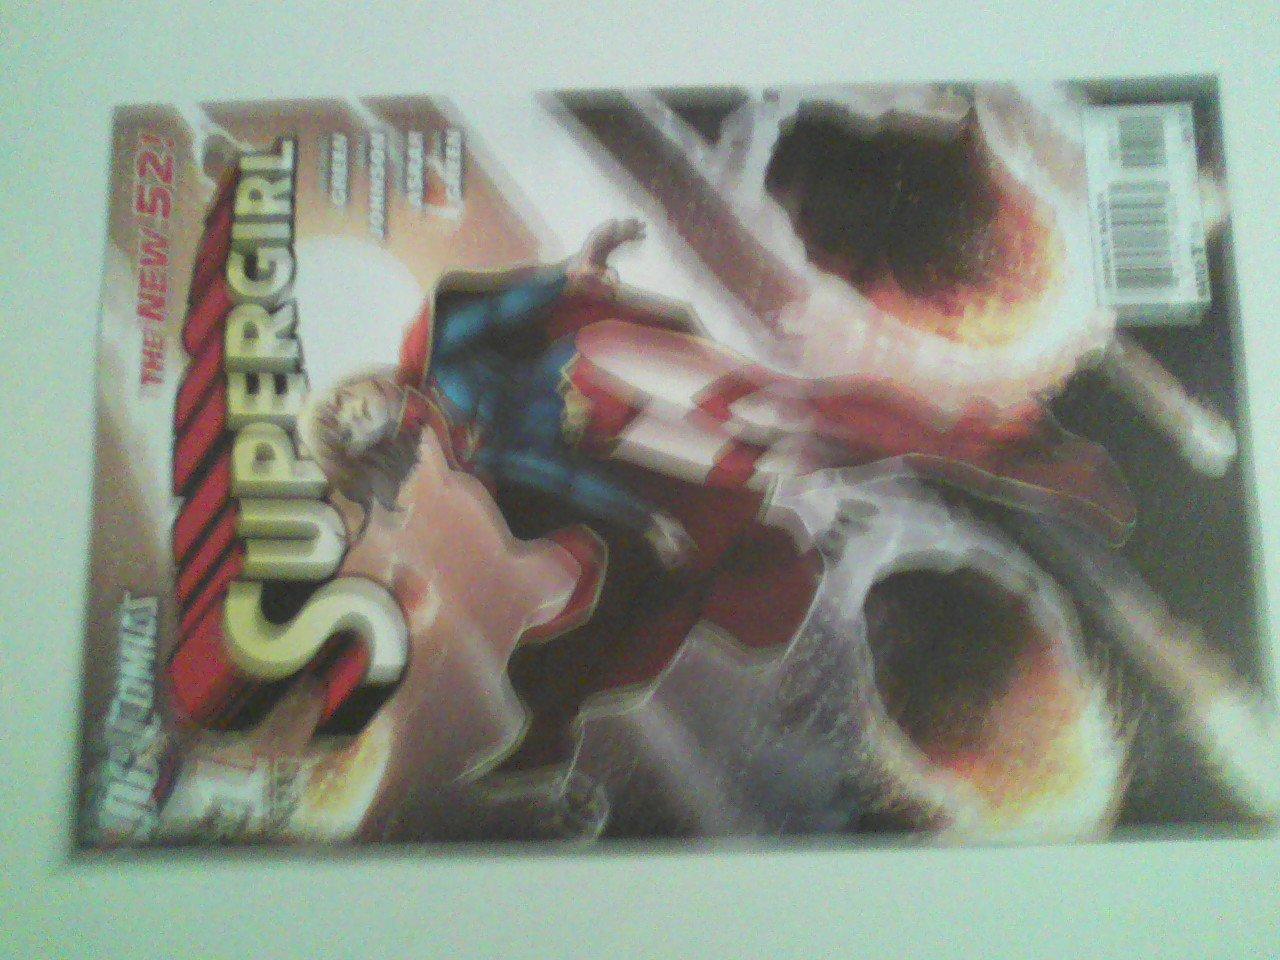 Supergirl #1 The new 52. Ms Marvel #3,Ms Marvel #4